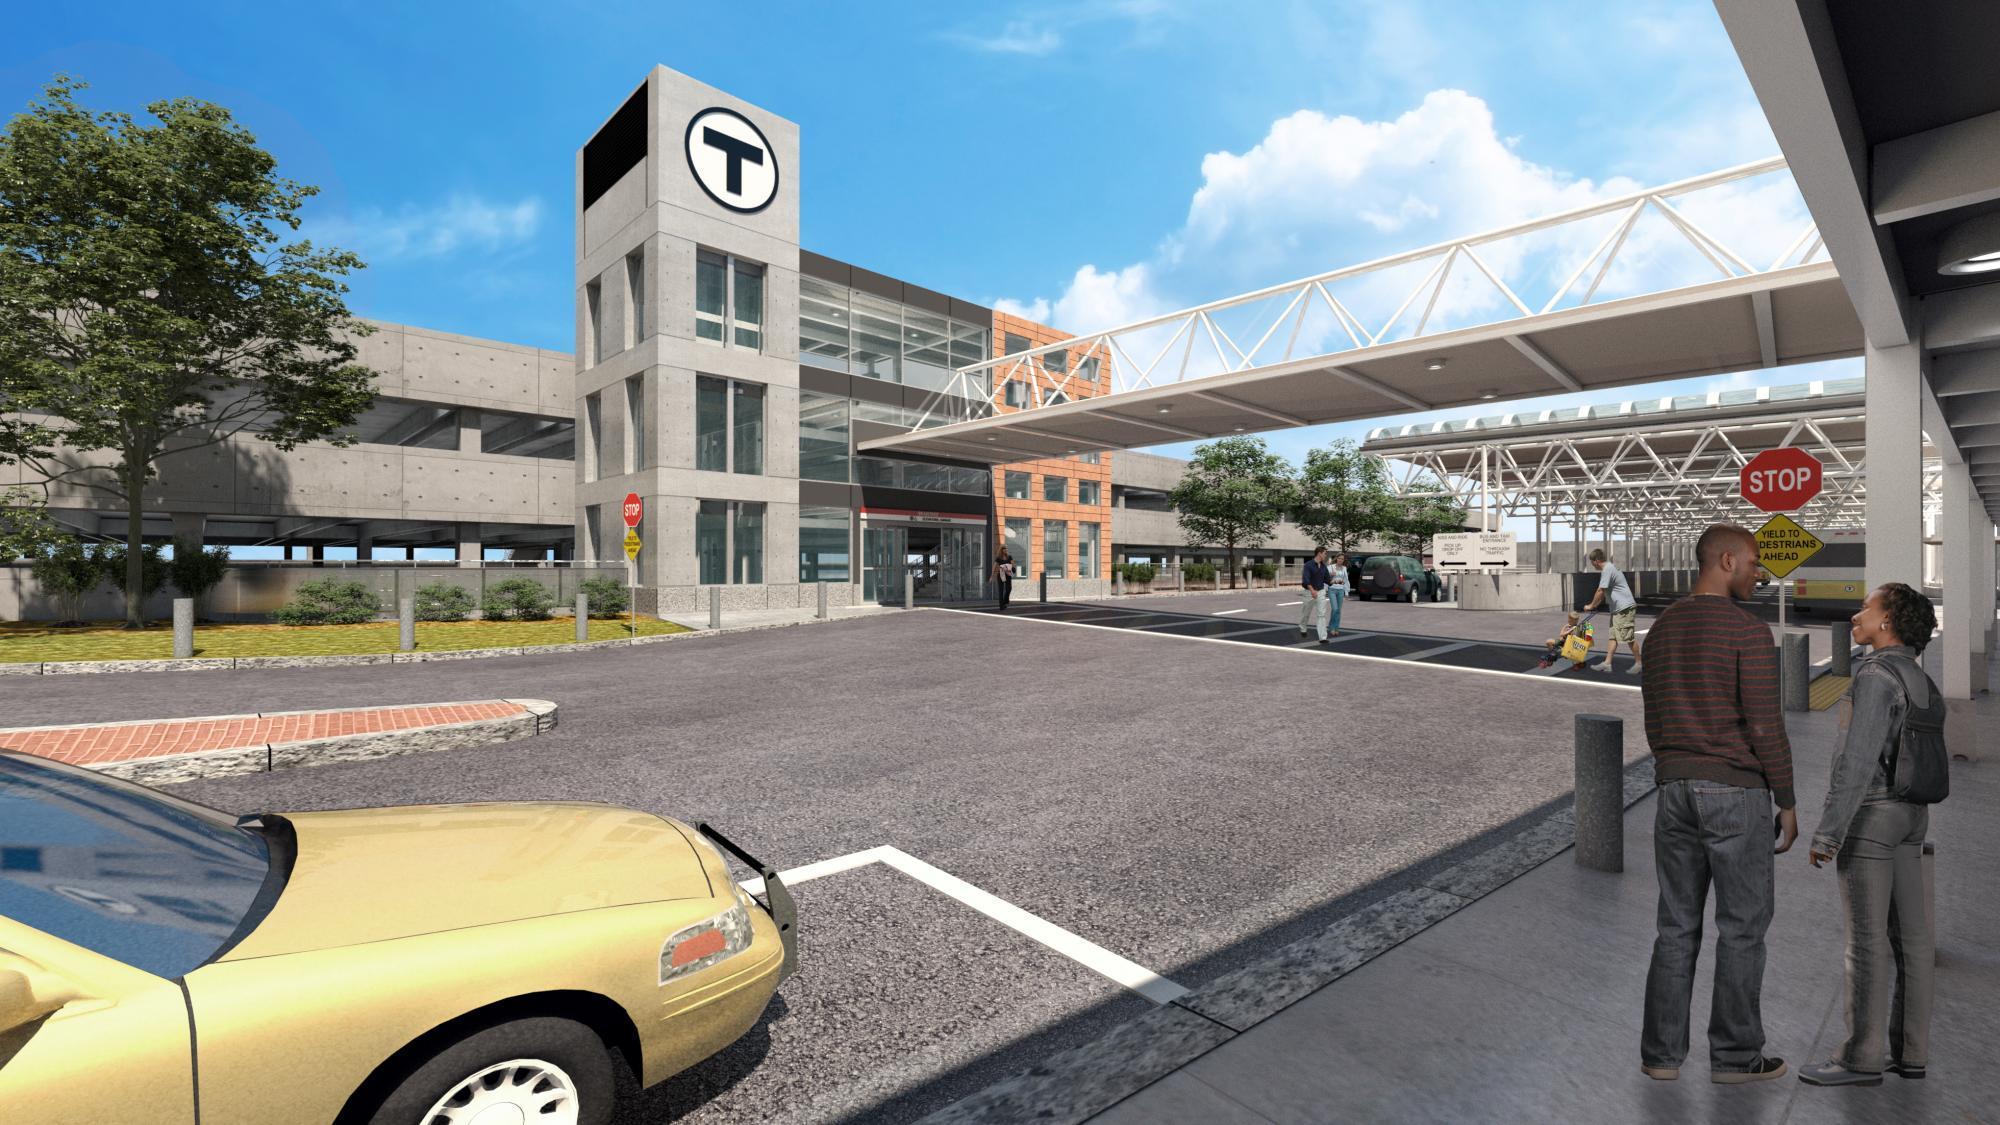 Rendering of the renovated garage Braintree station